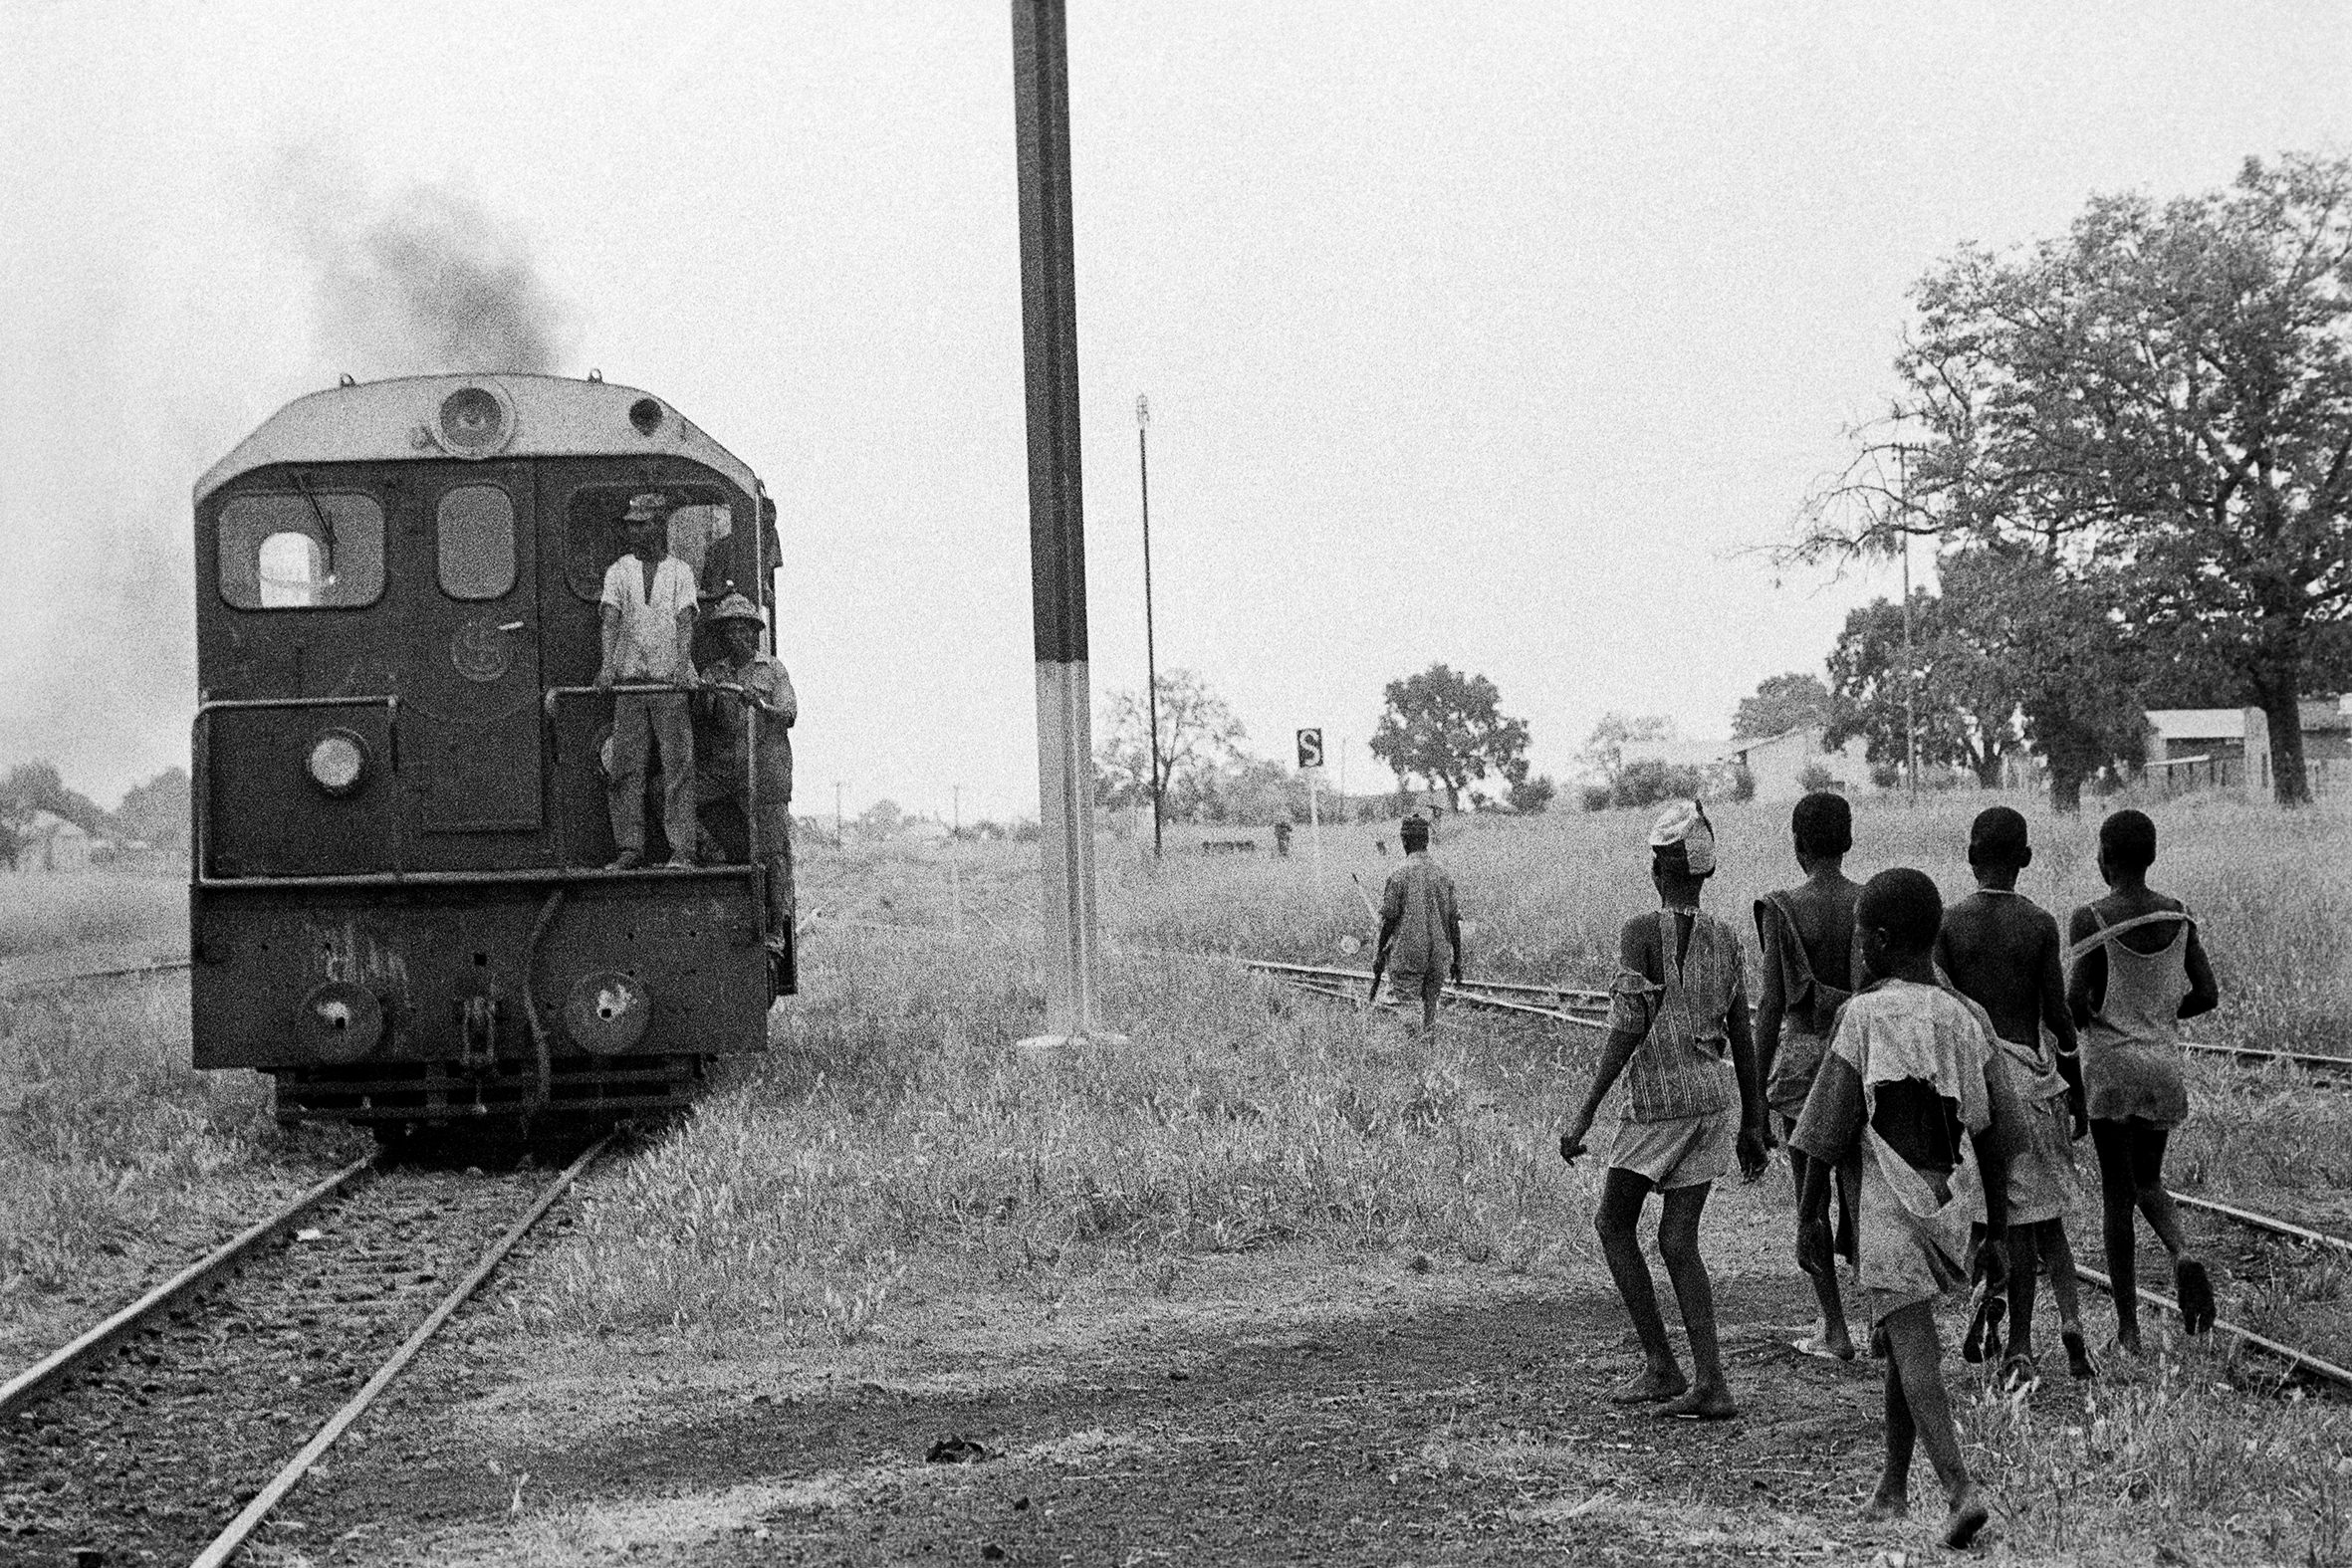 AFRICA - 10 – In viaggio, Tambacounda, Senegal, 1970